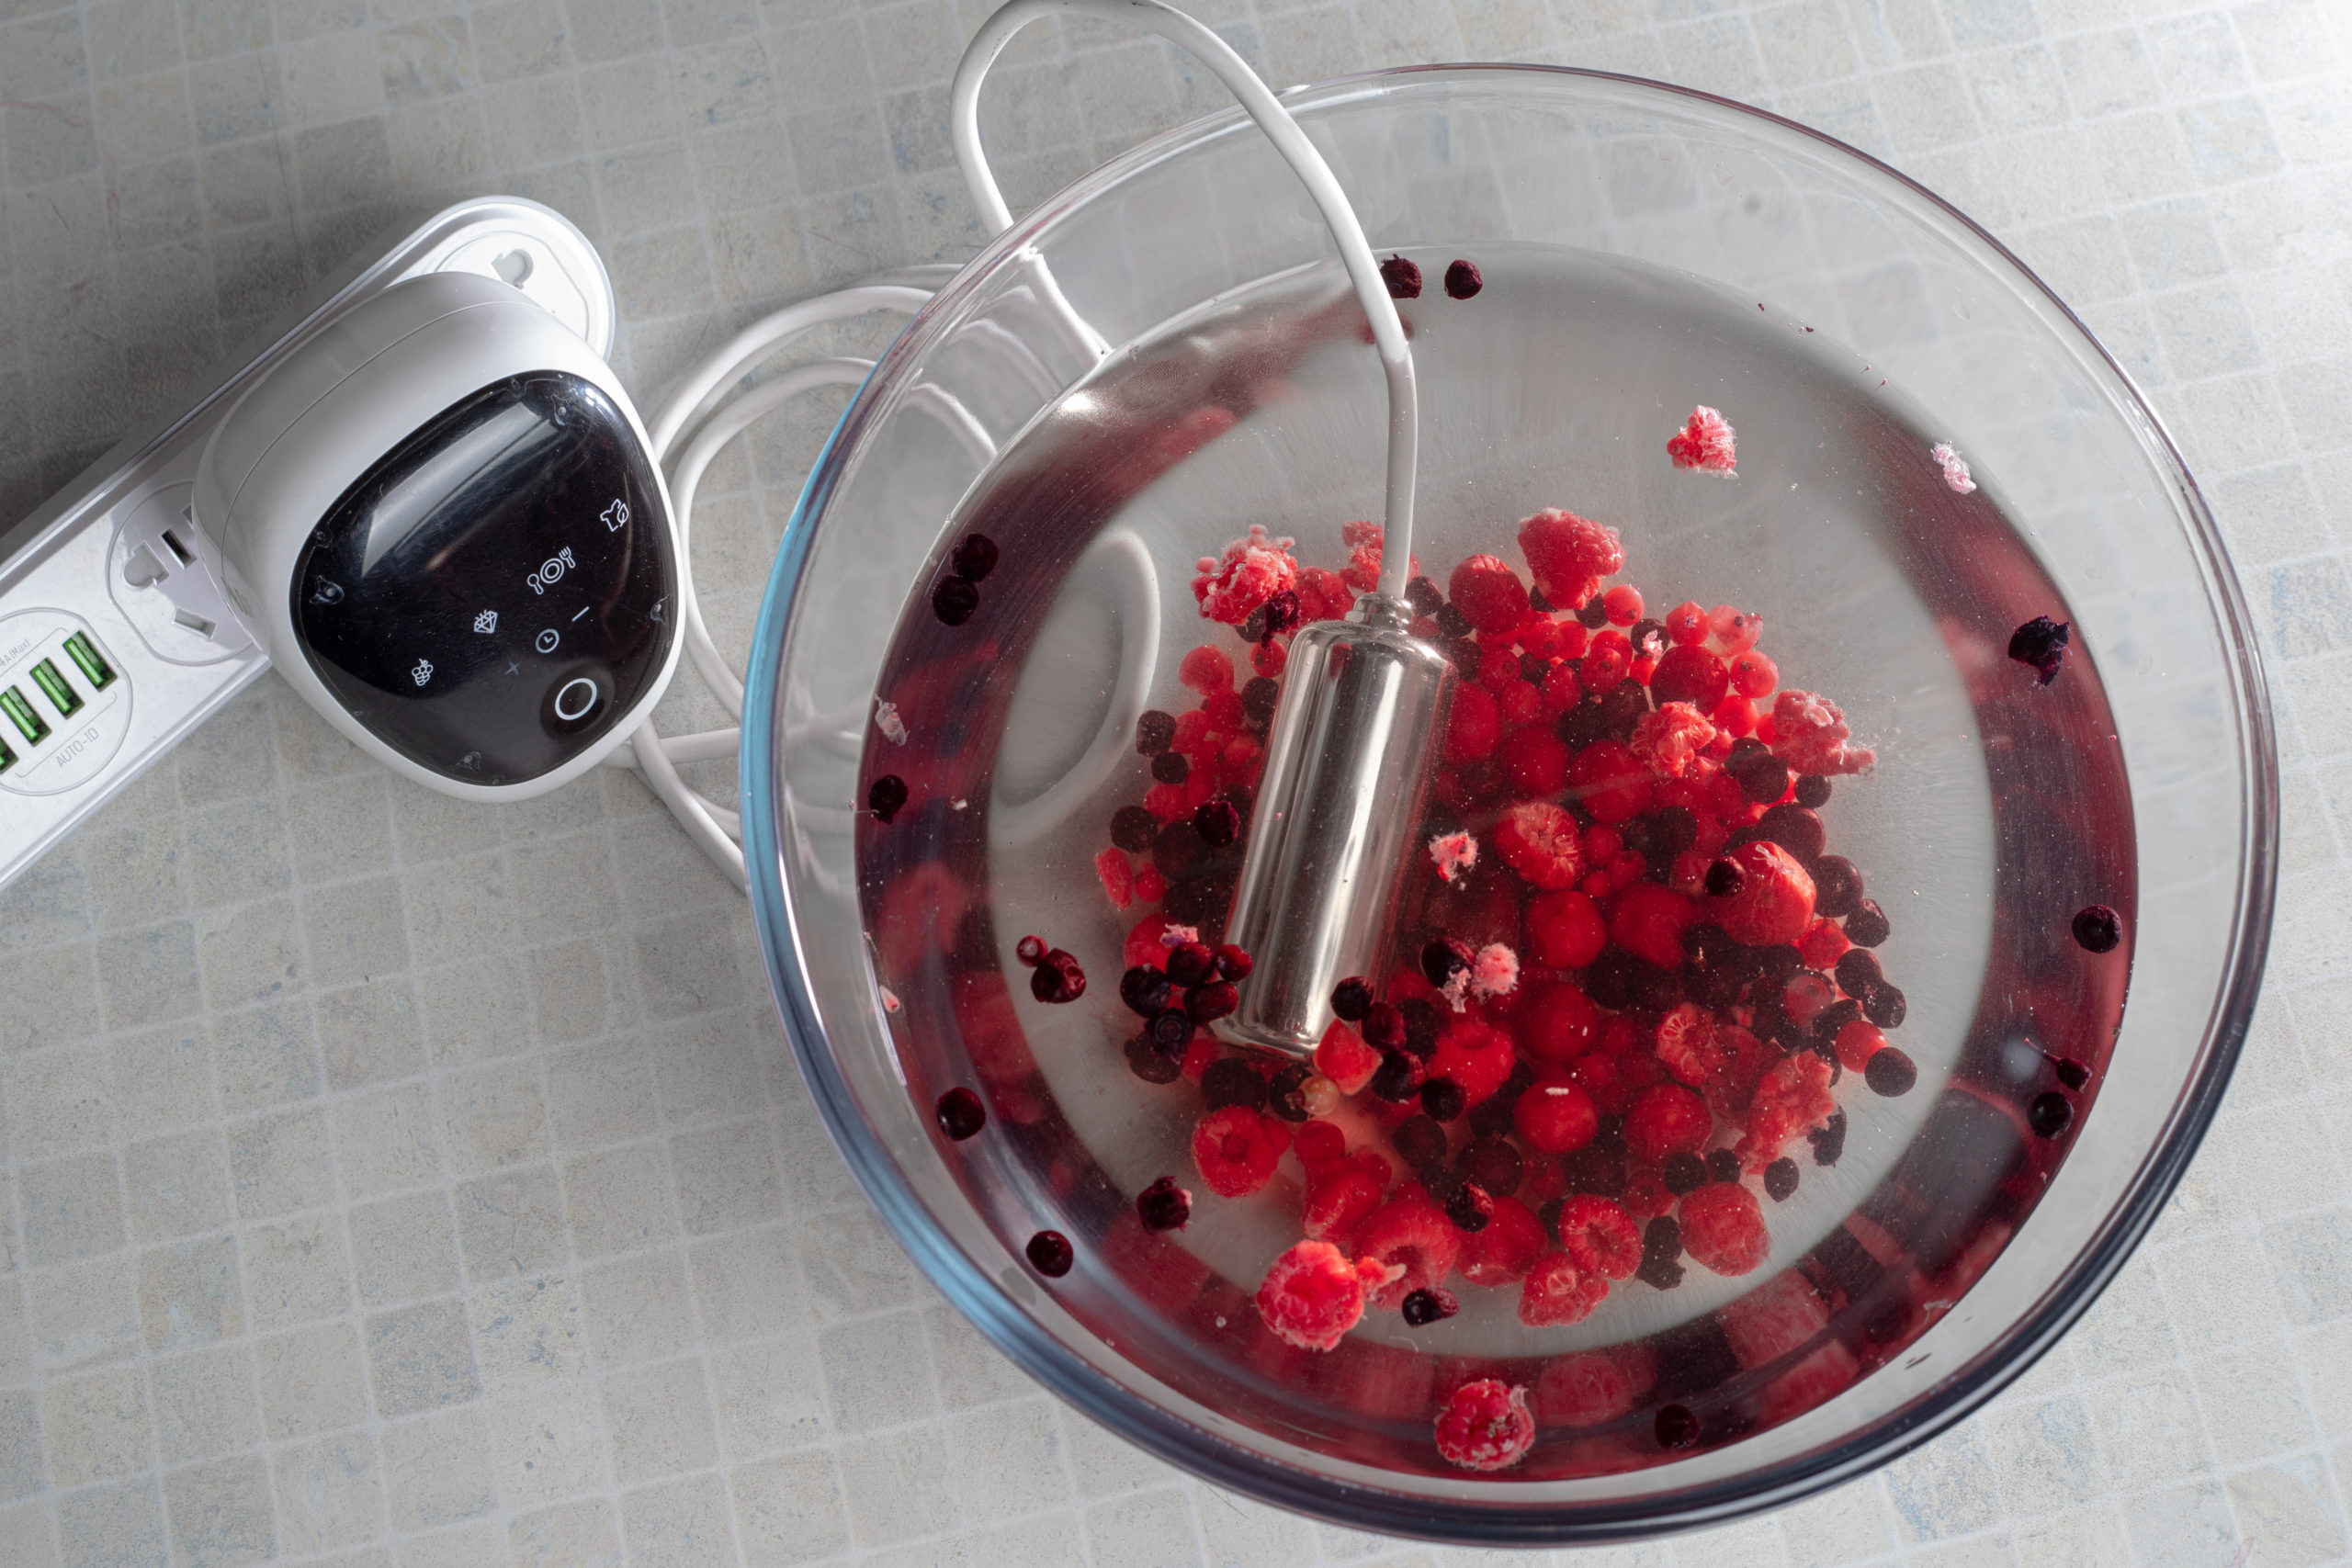 Ultrasona with berries